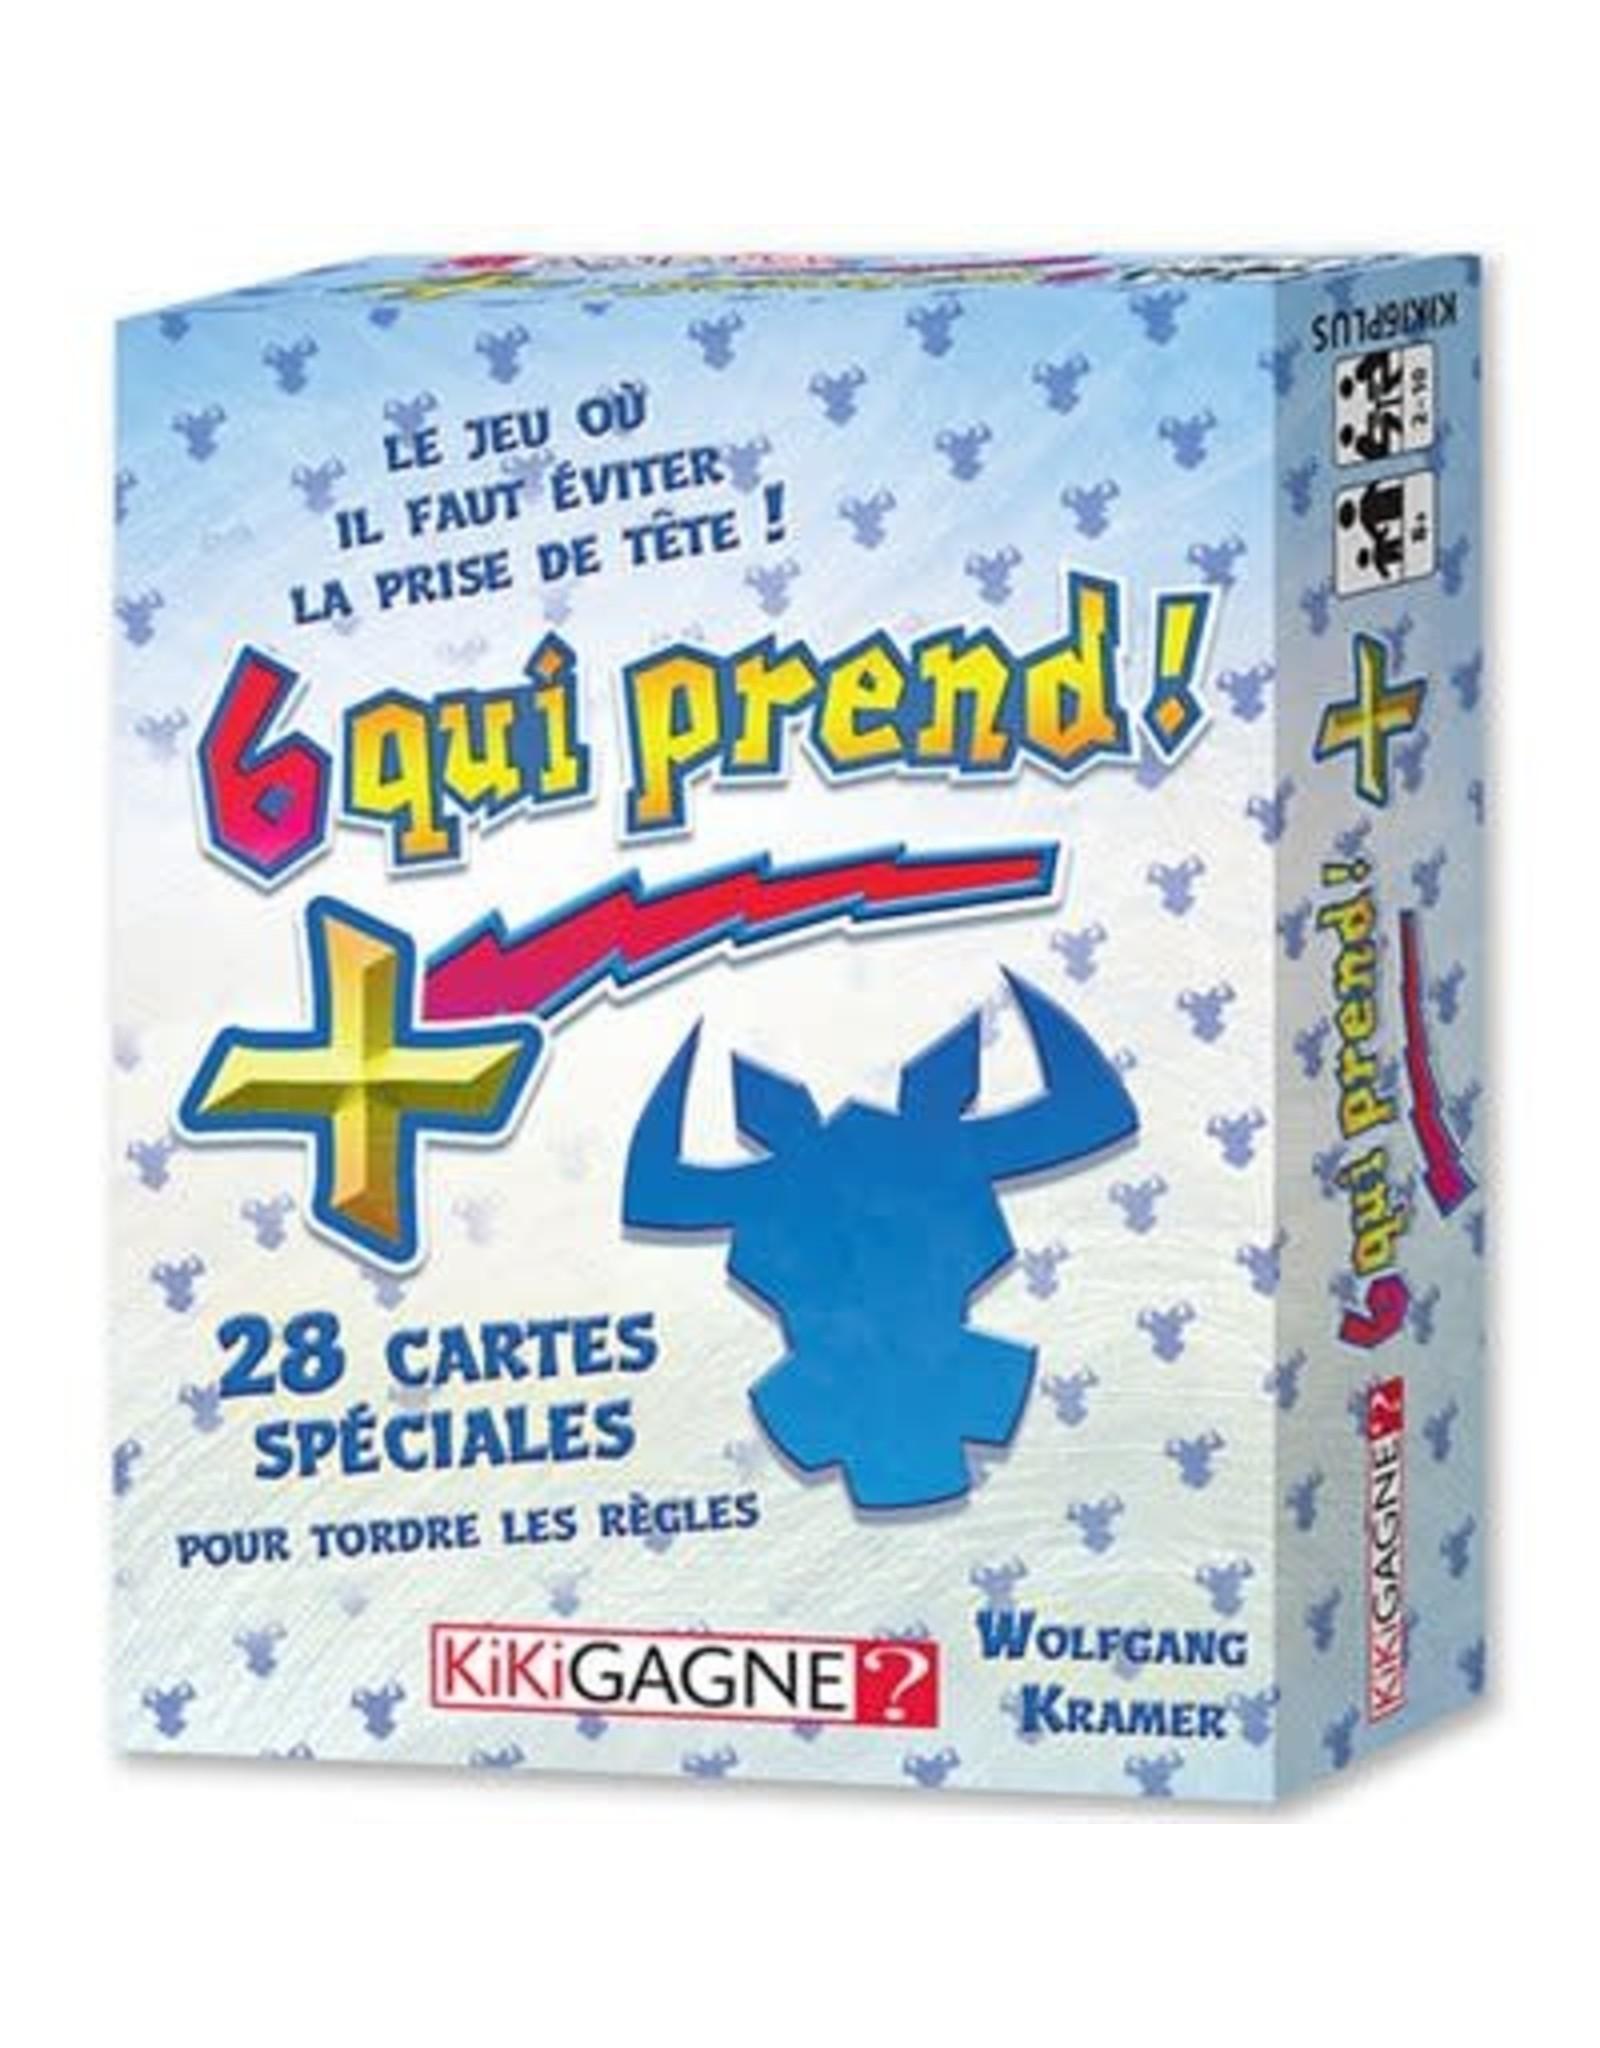 Kikigagne 6 QUI PREND! + (FR)